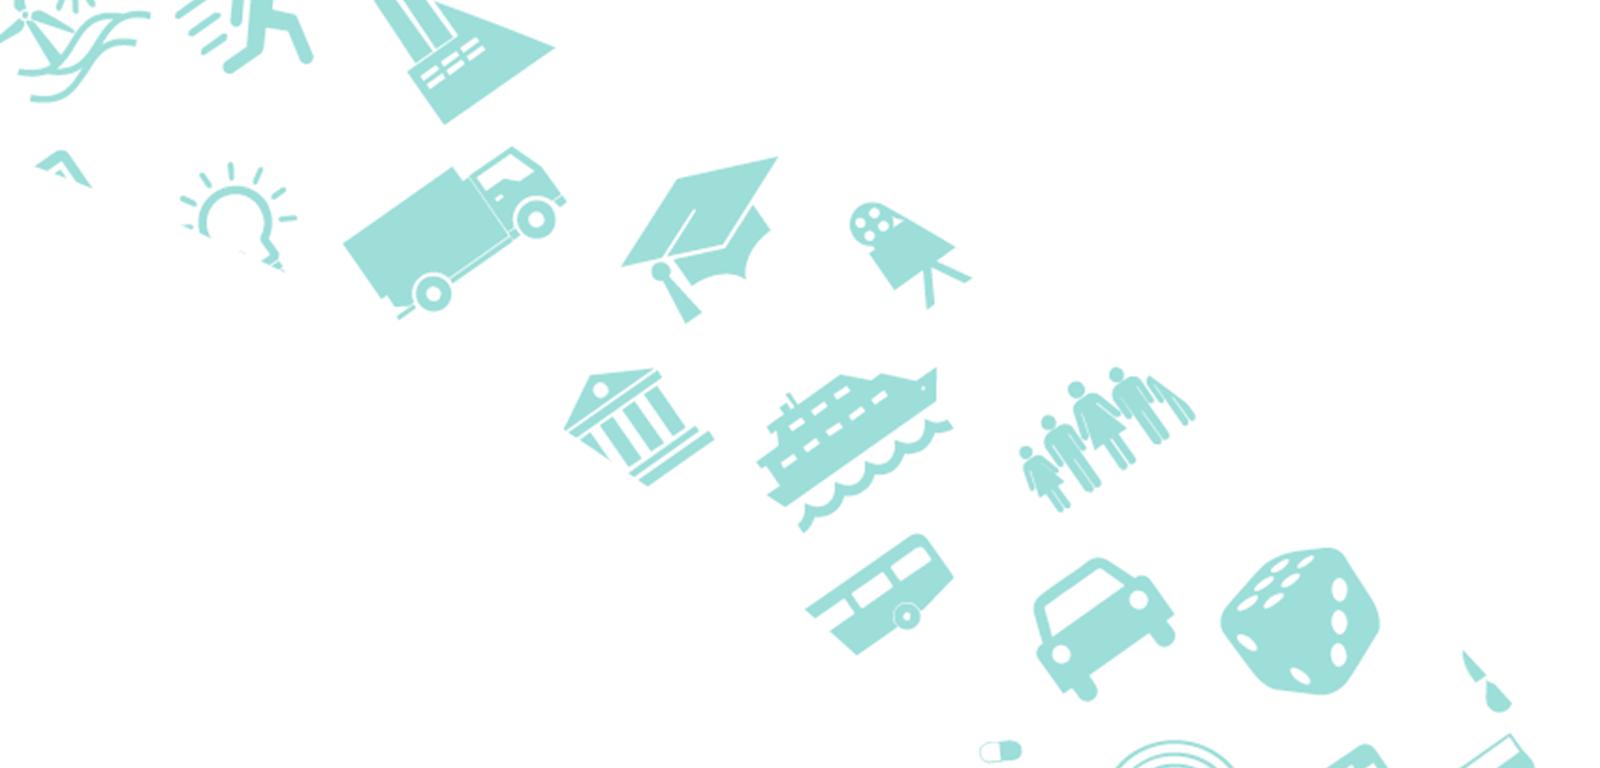 Barrières bij real time energiebesparingsdiensten